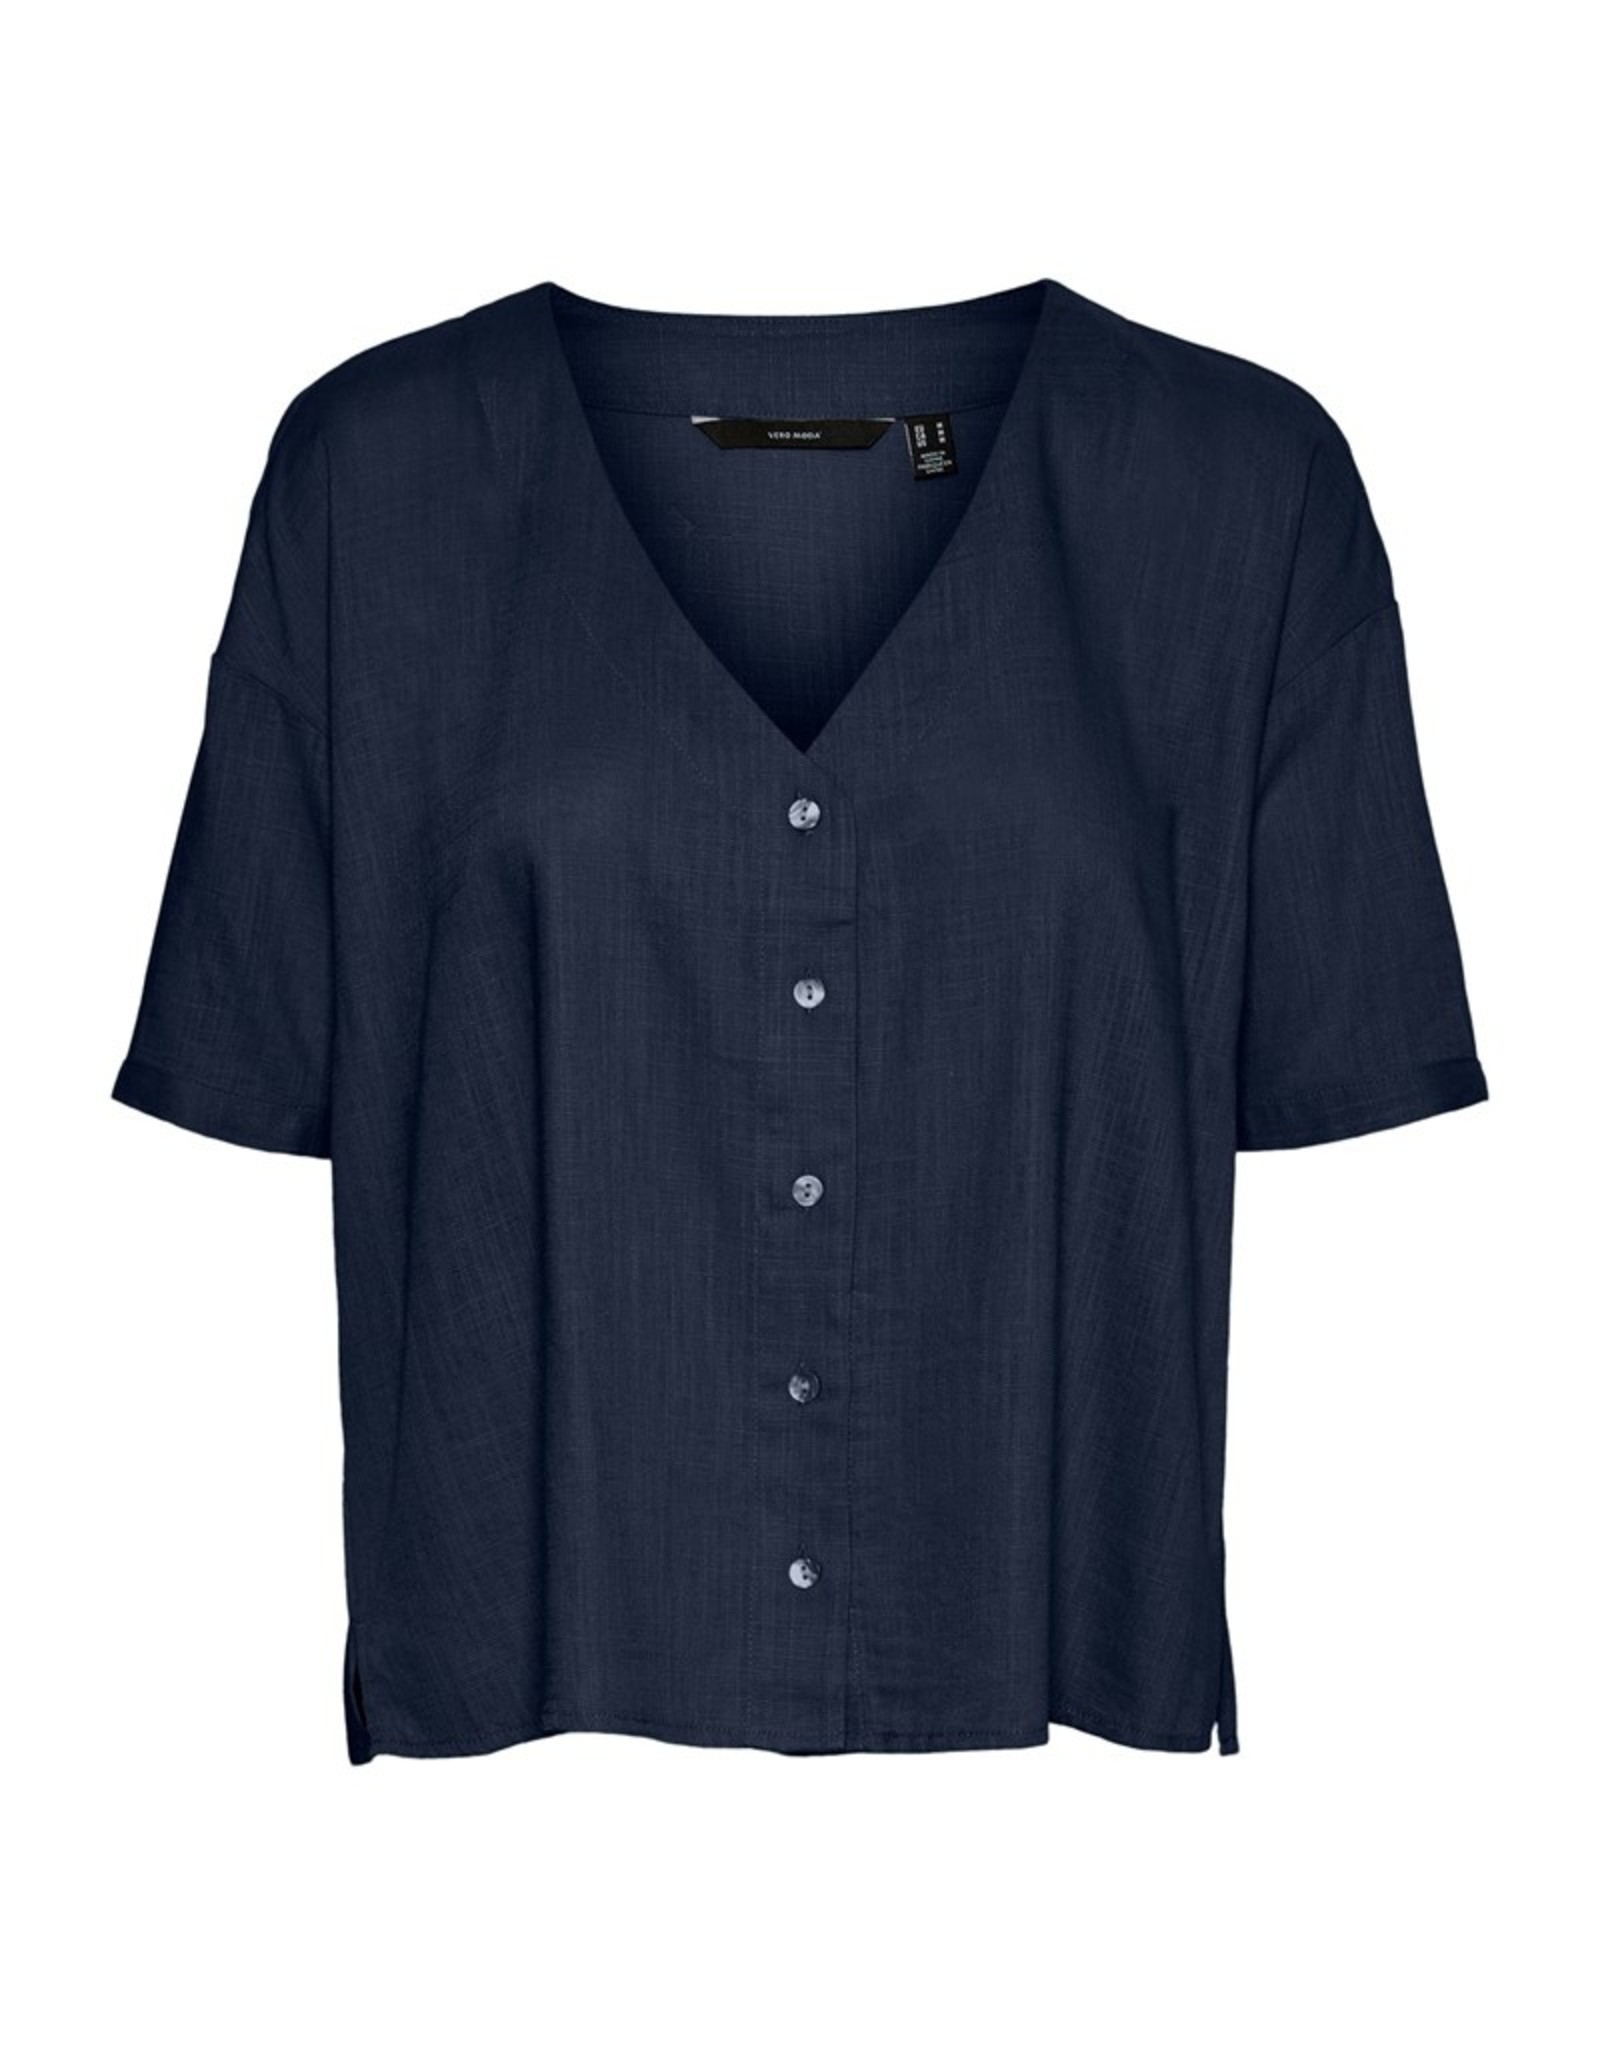 Vero Moda Haf Shirt